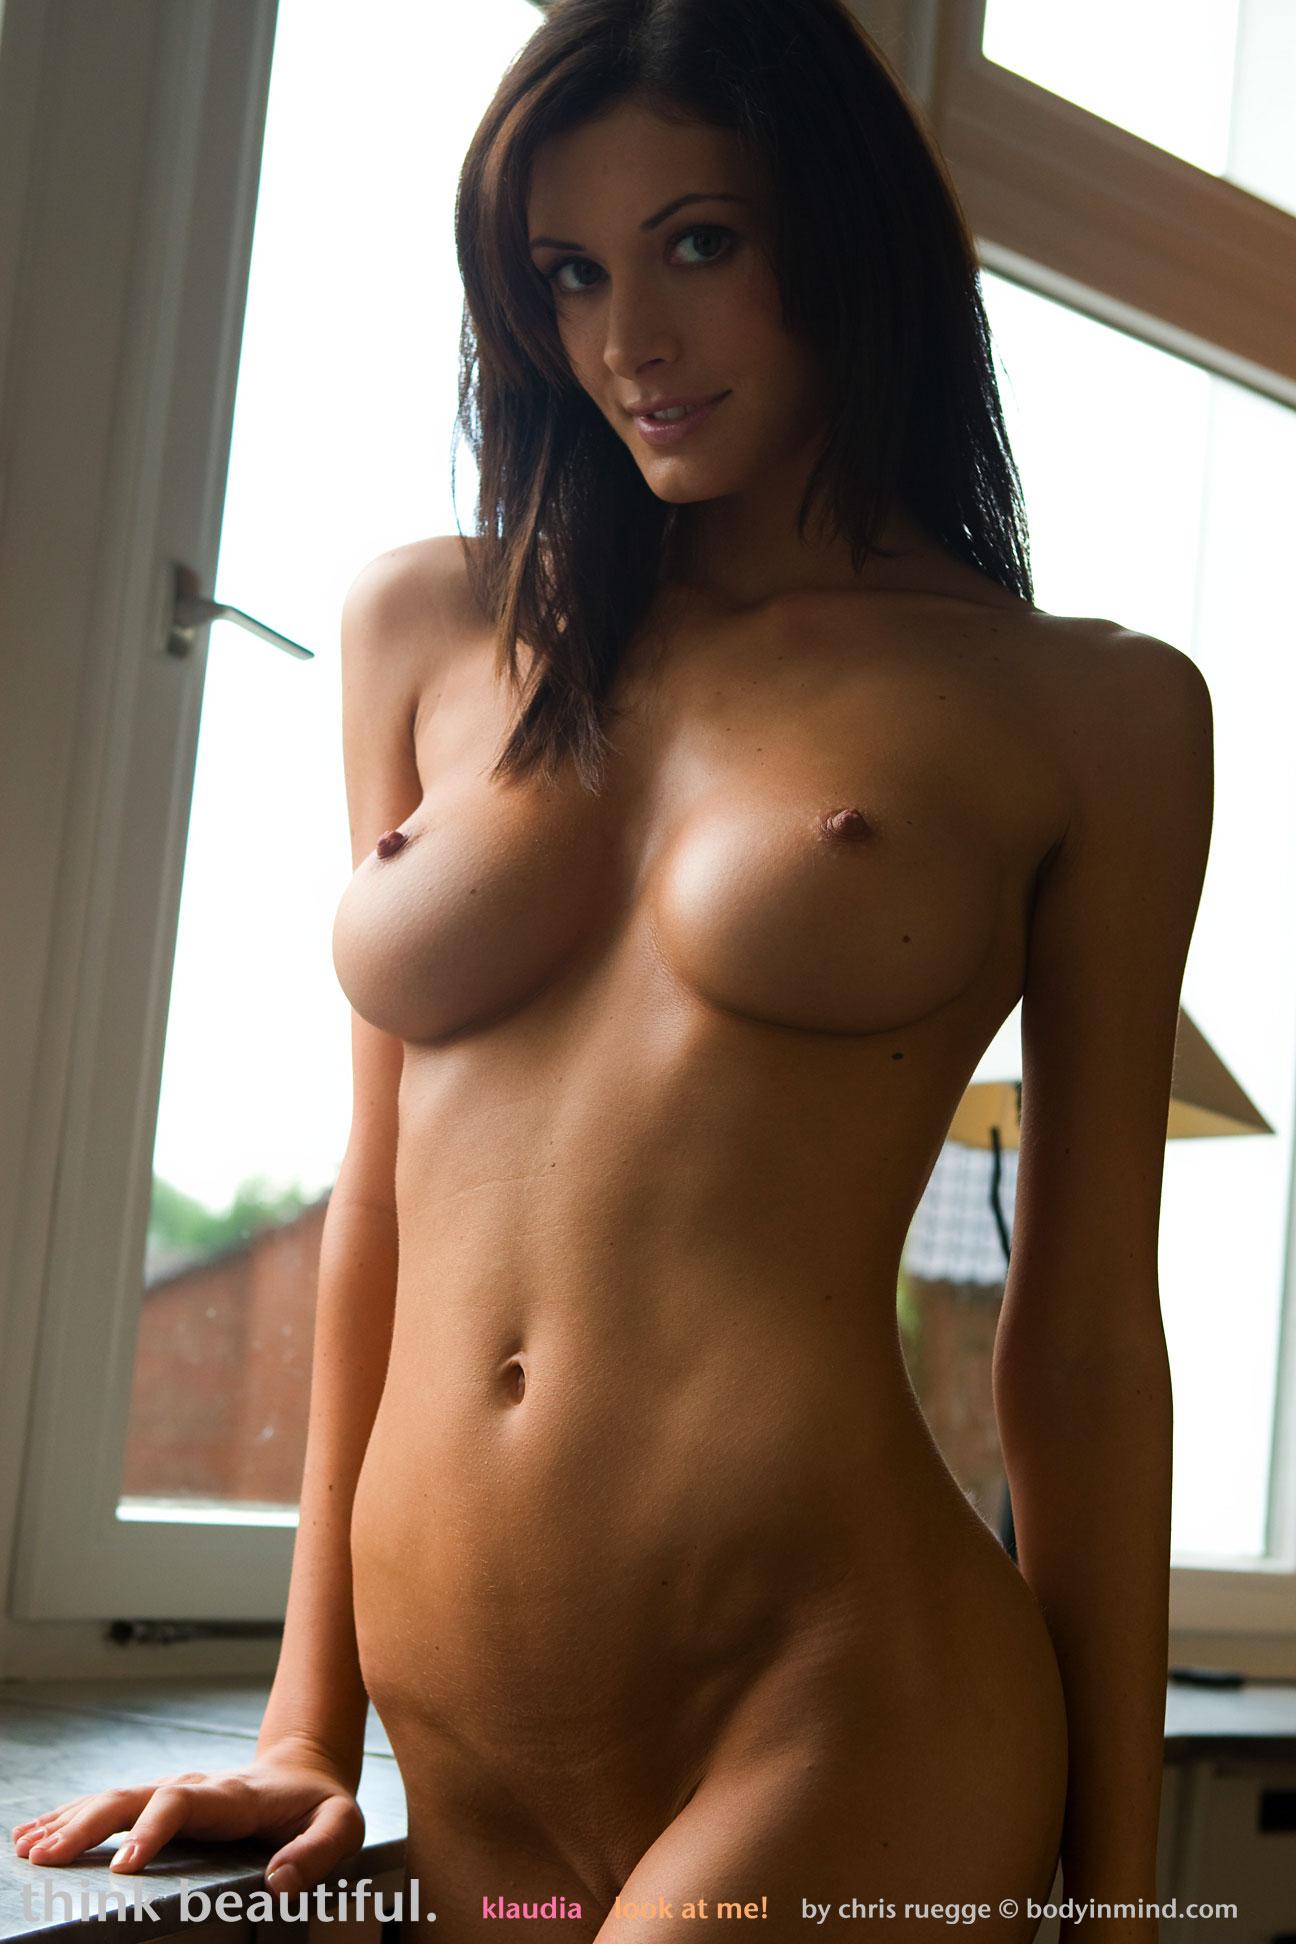 sexy girl getting fuked in public